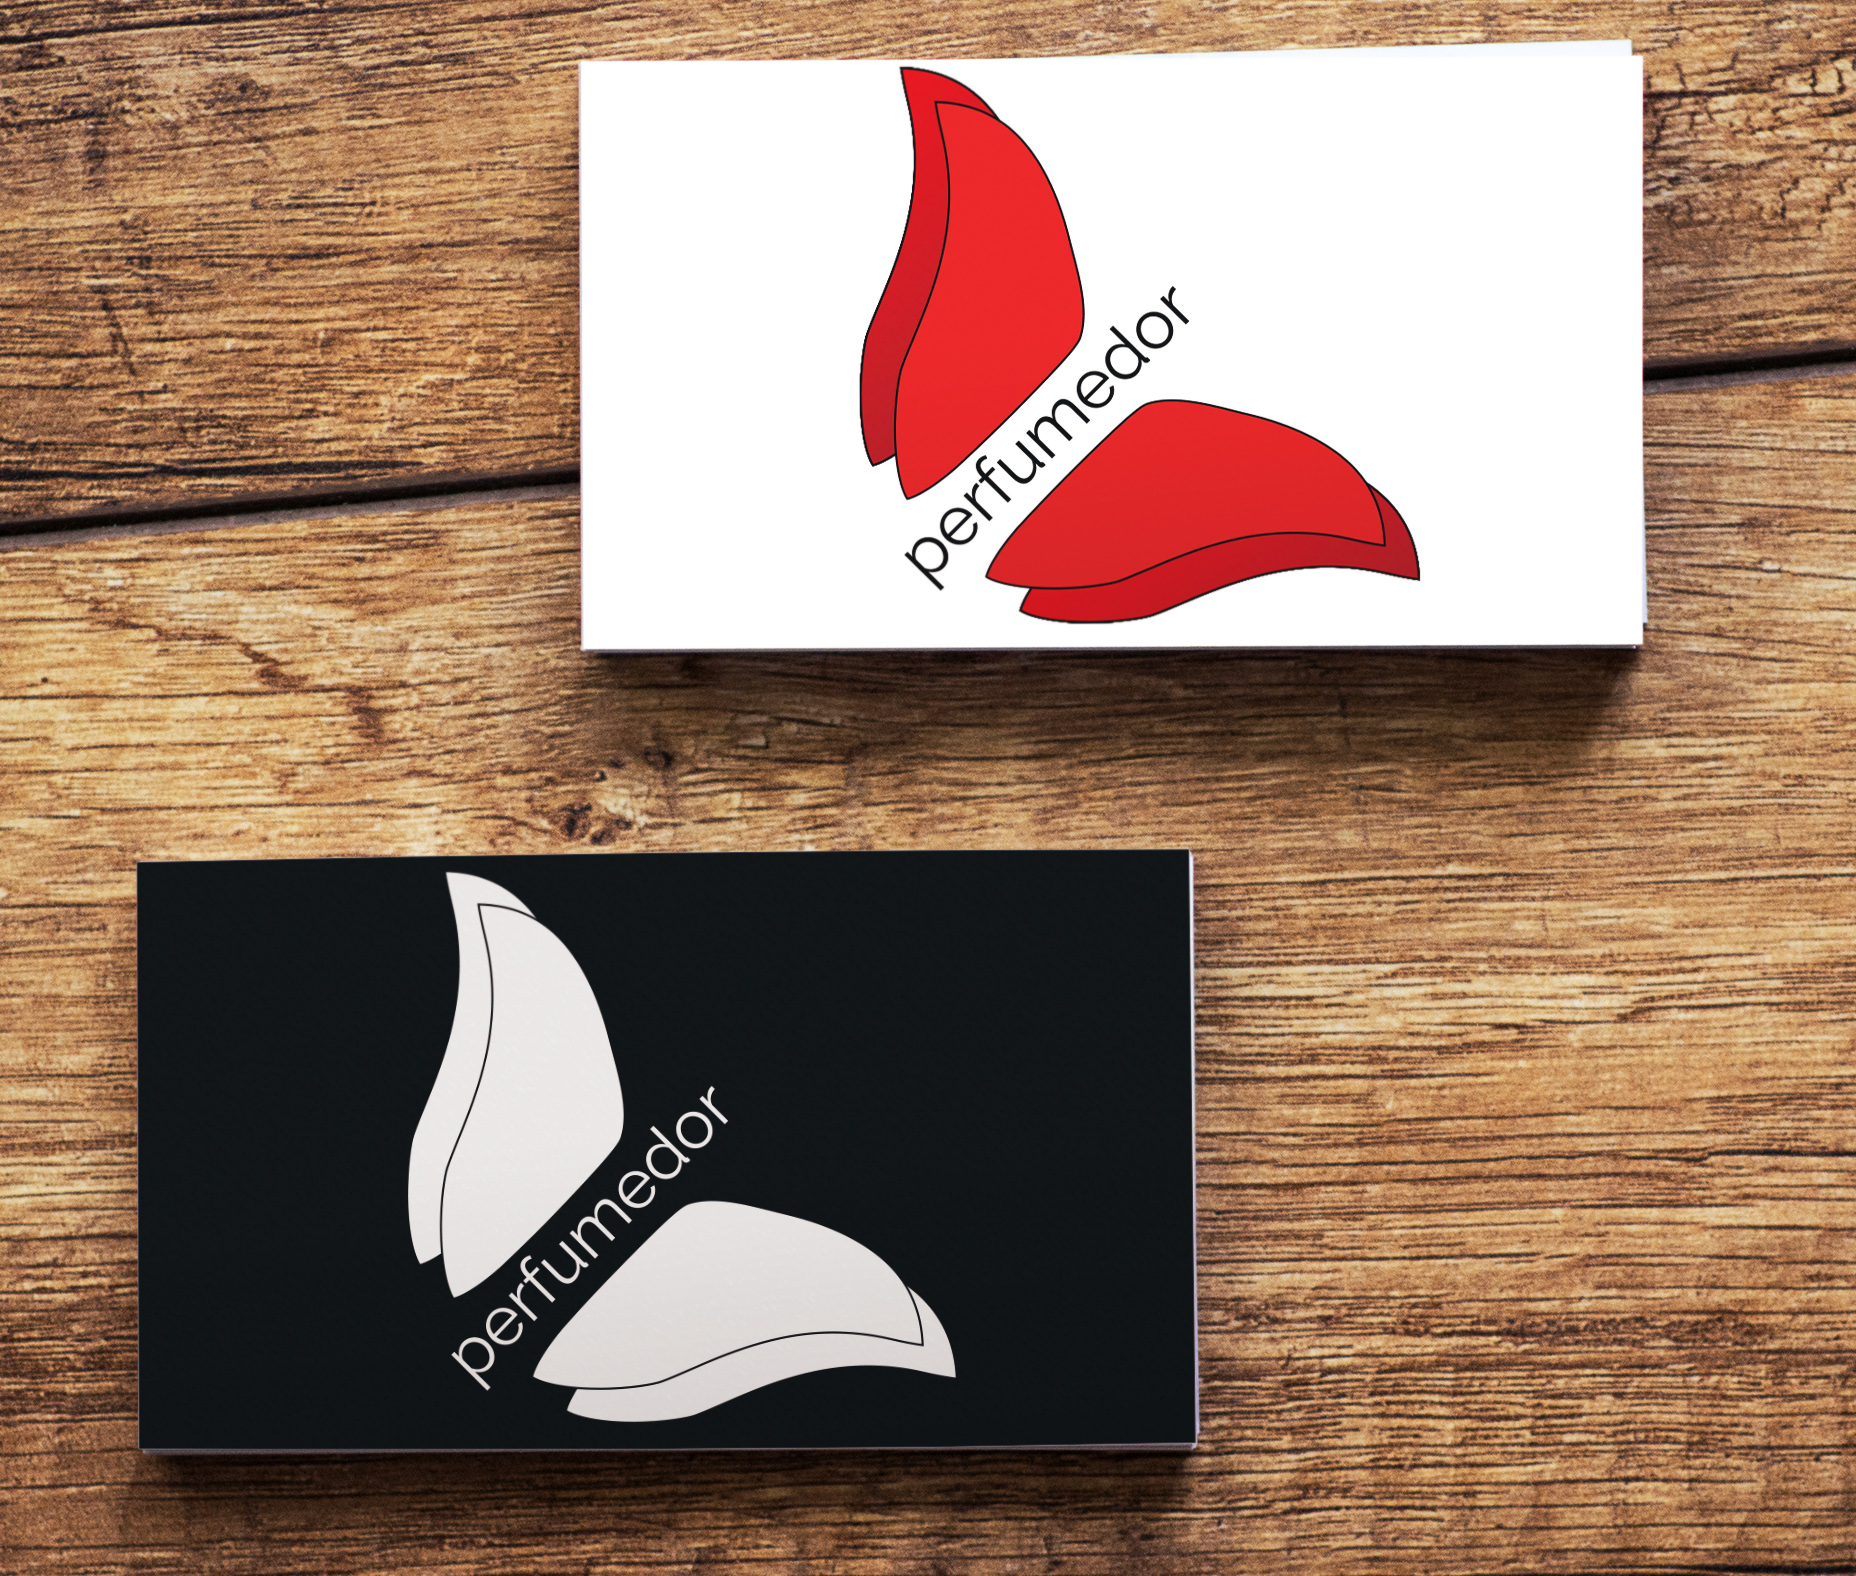 Логотип для интернет-магазина парфюмерии фото f_9275b447fac8e8ea.jpg